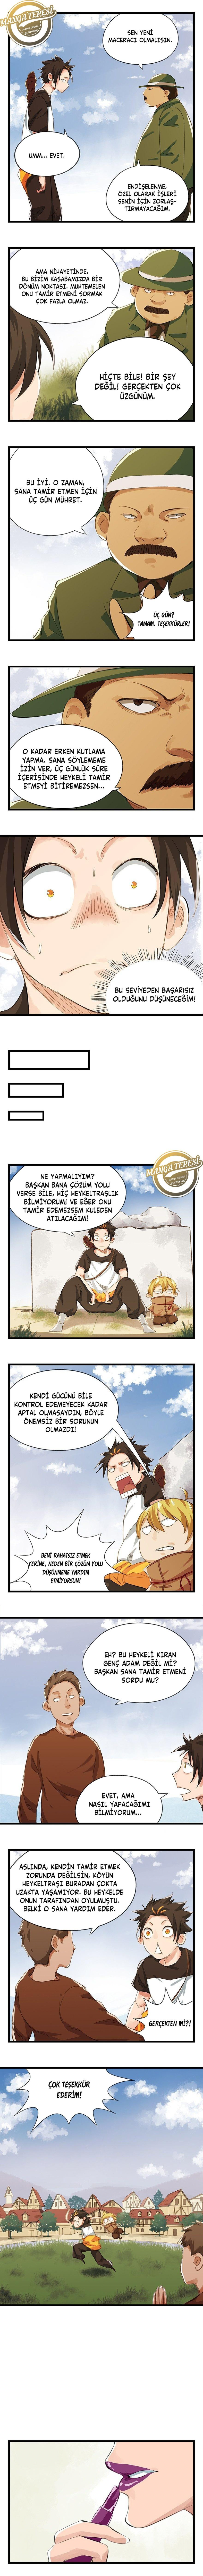 tower-into-the-cloudsbolum-16